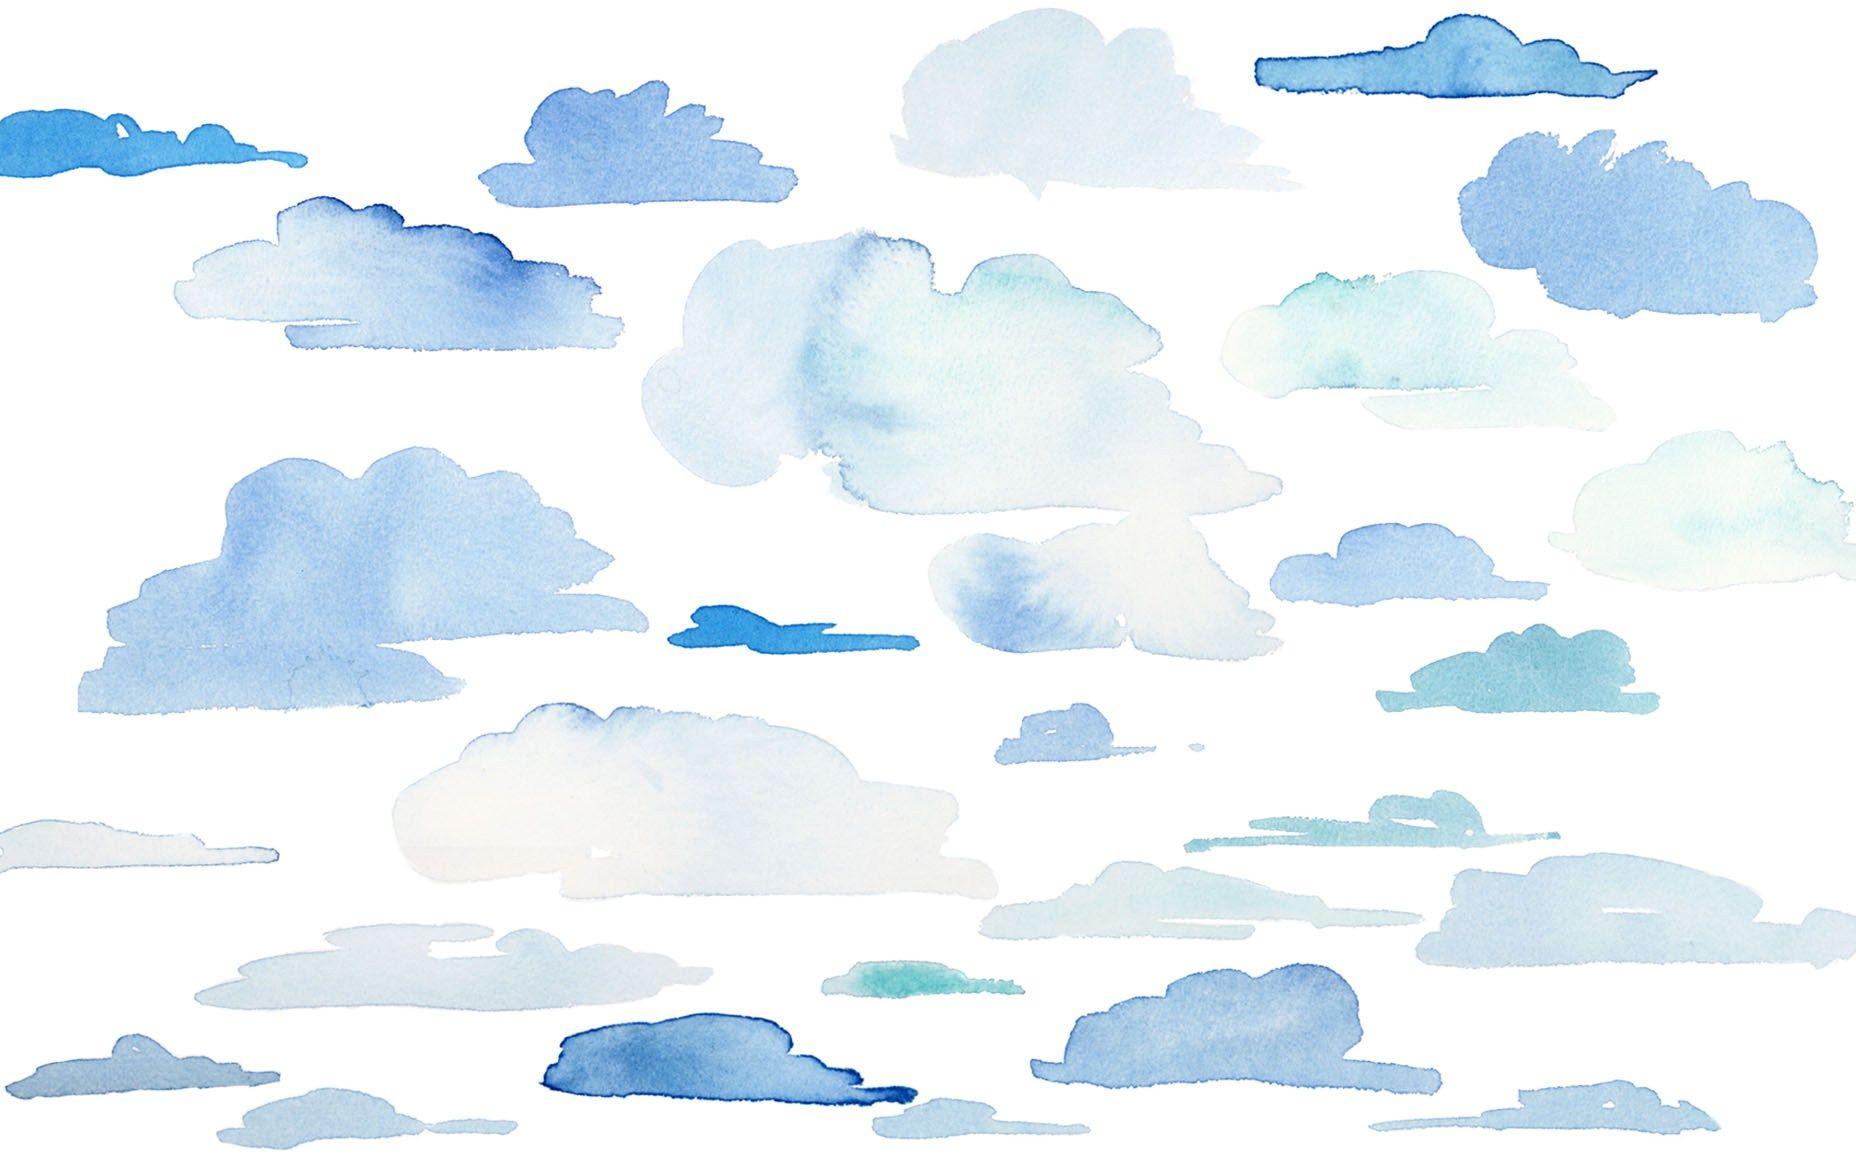 Happy Diwali Desktop Pc Laptop Hd Wallpapers Full Screen: 30 Free Beautiful Watercolor Wallpapers That Should Be On